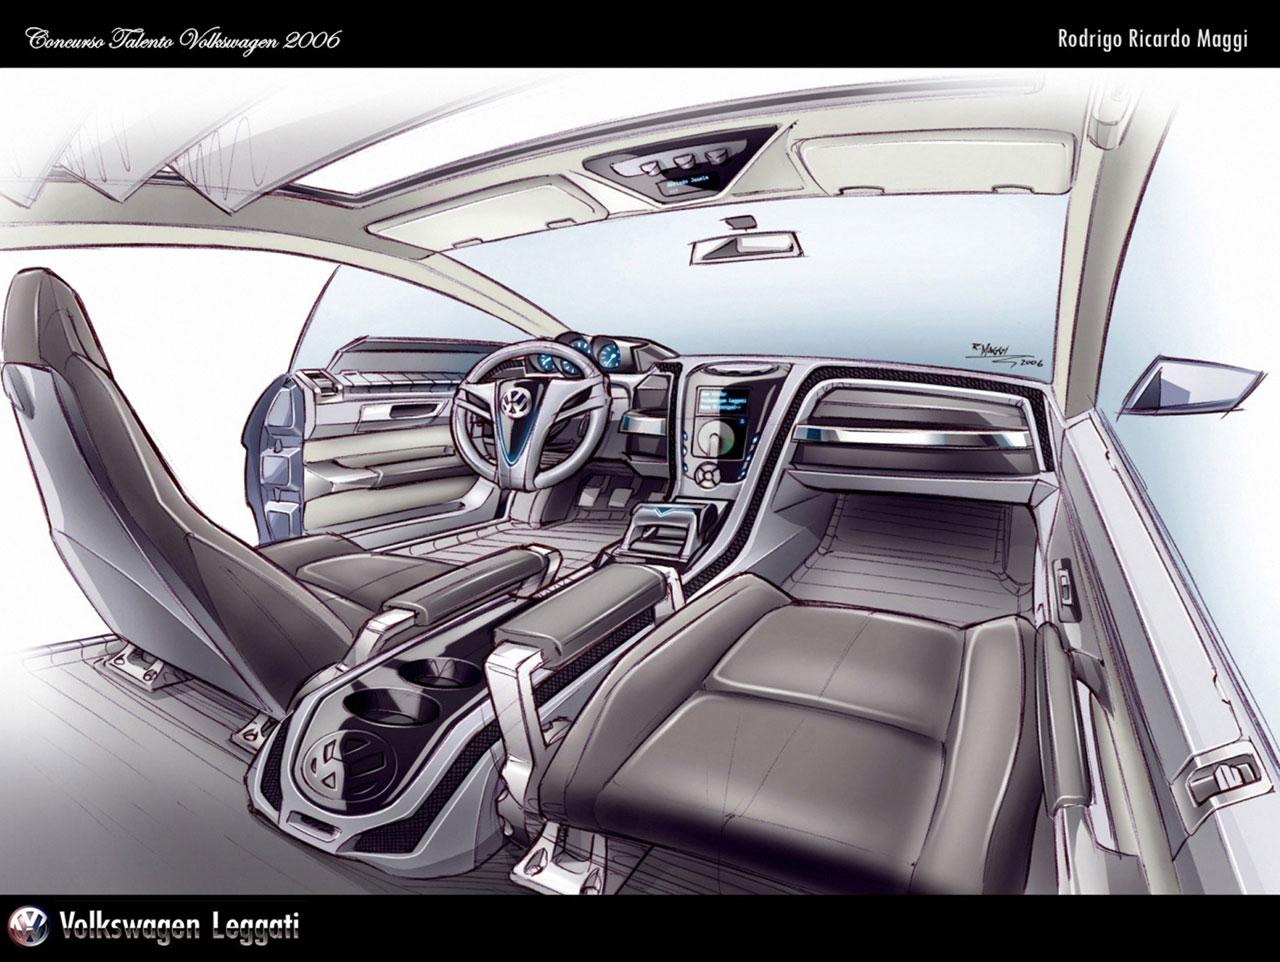 Vw Brazil Design Sketches Page 27 Car Body Design